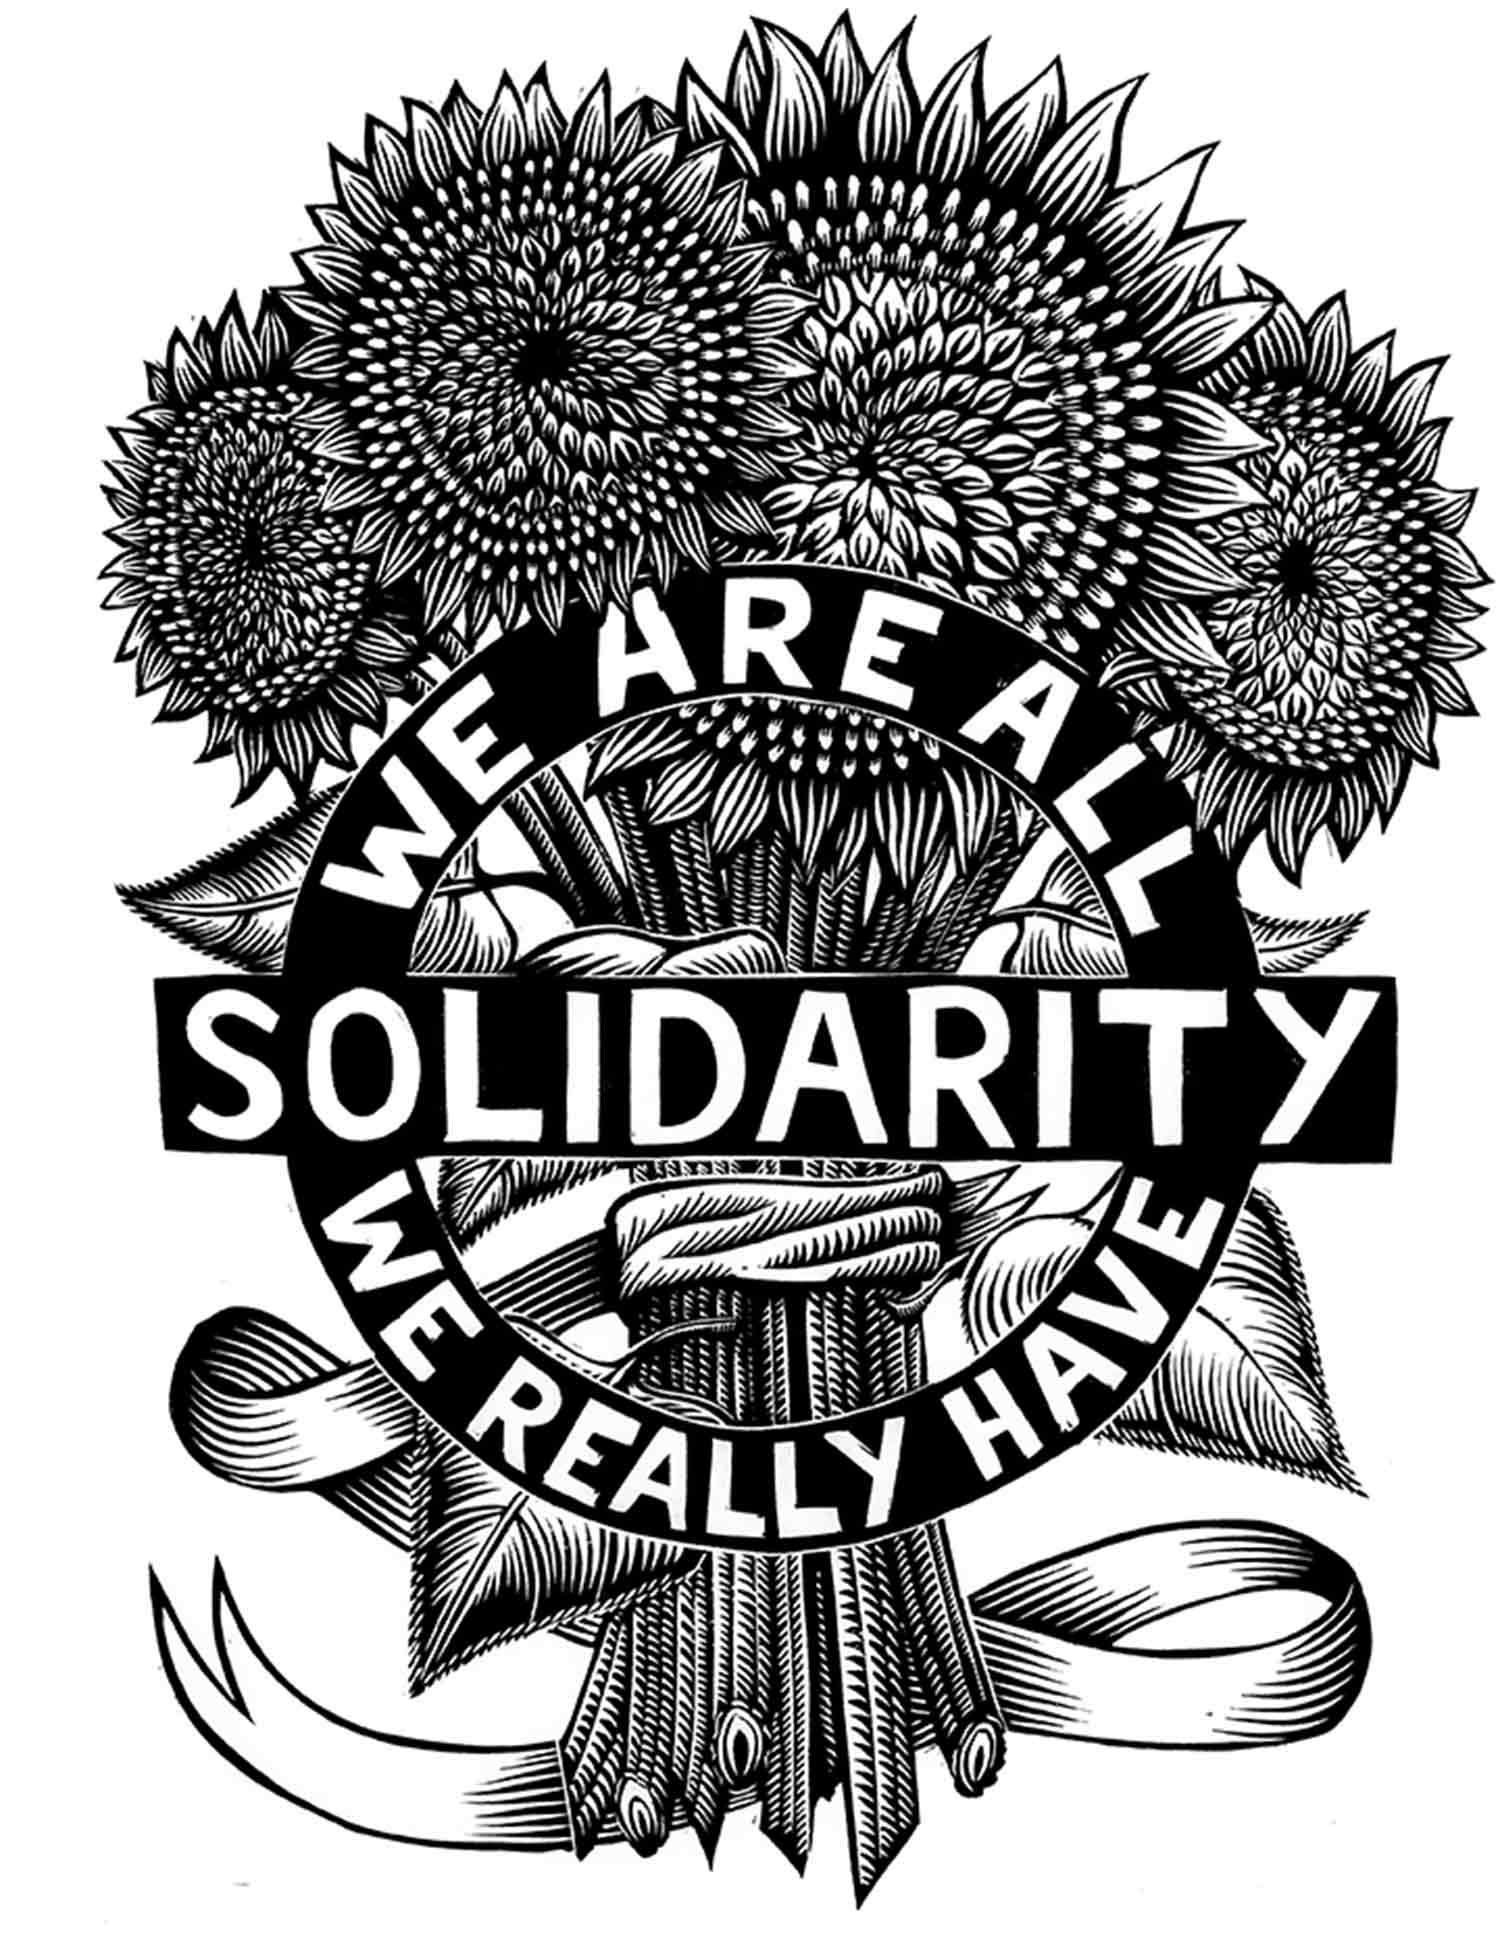 Justseeds Solidarity Sunflowers